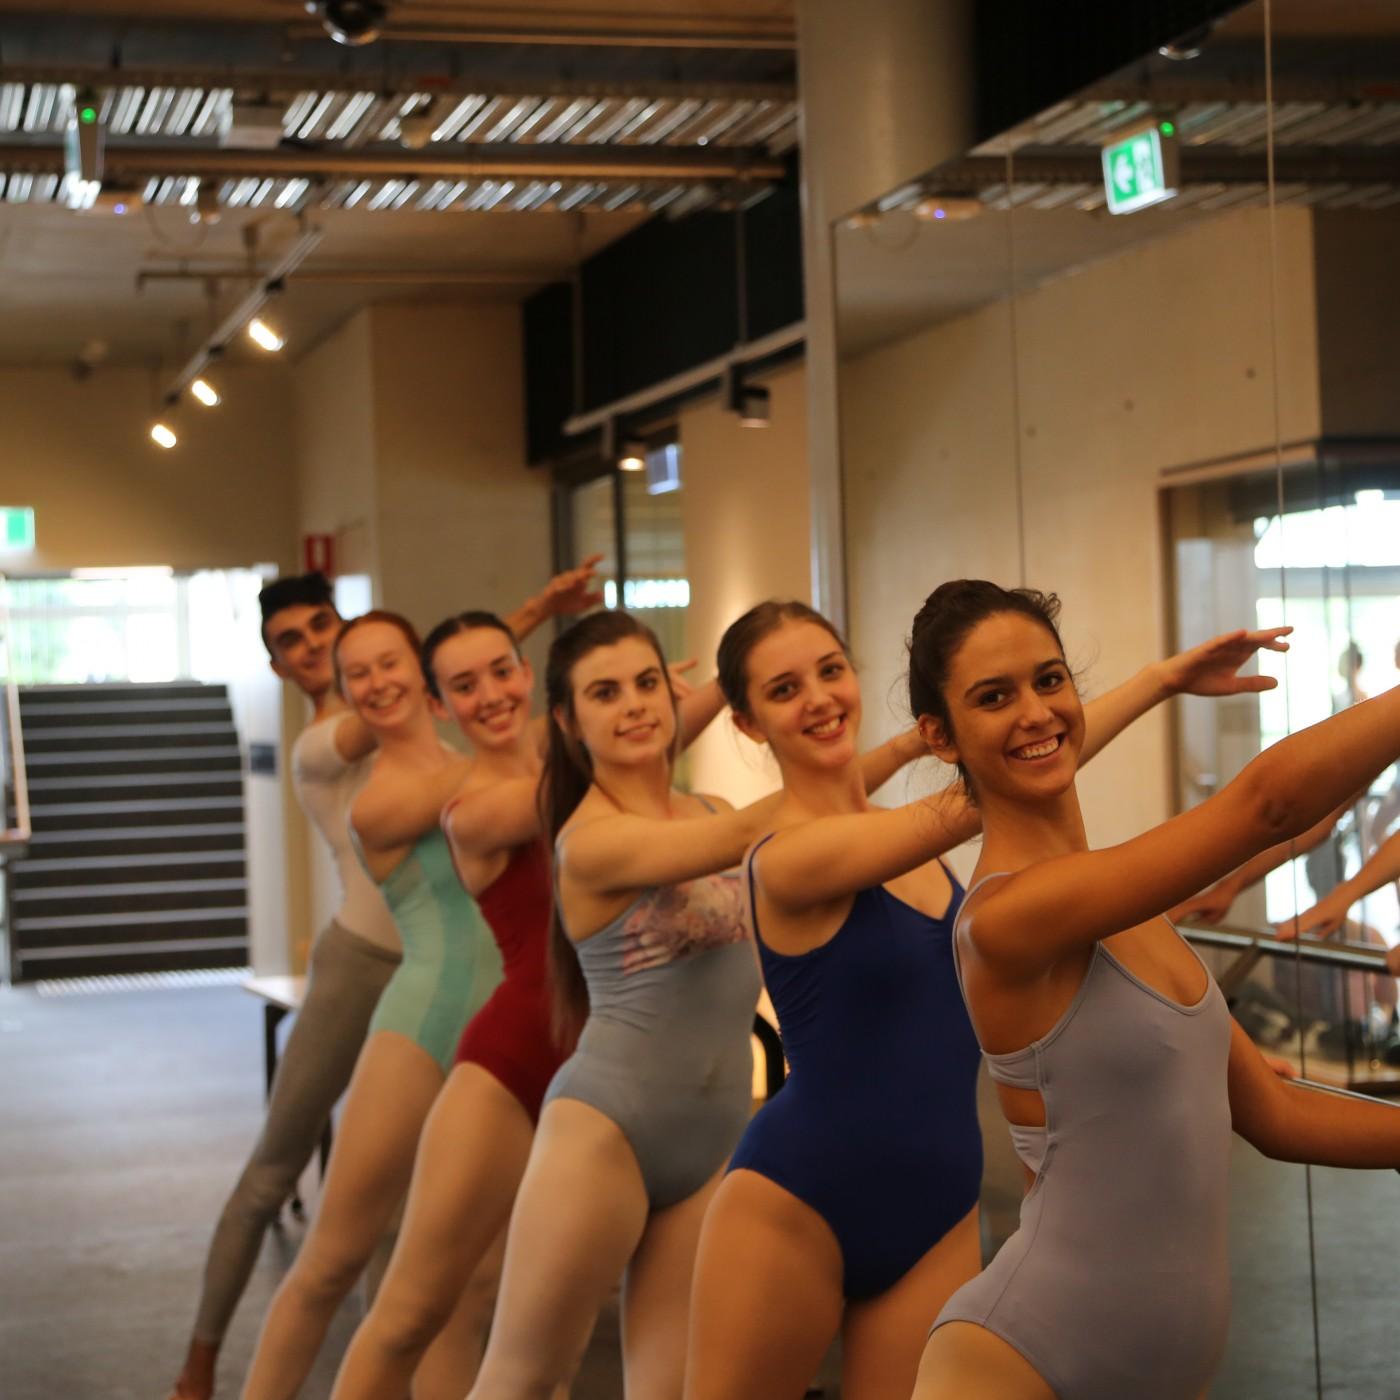 Eddie, Lucinda, Meg, Orla – Dancers